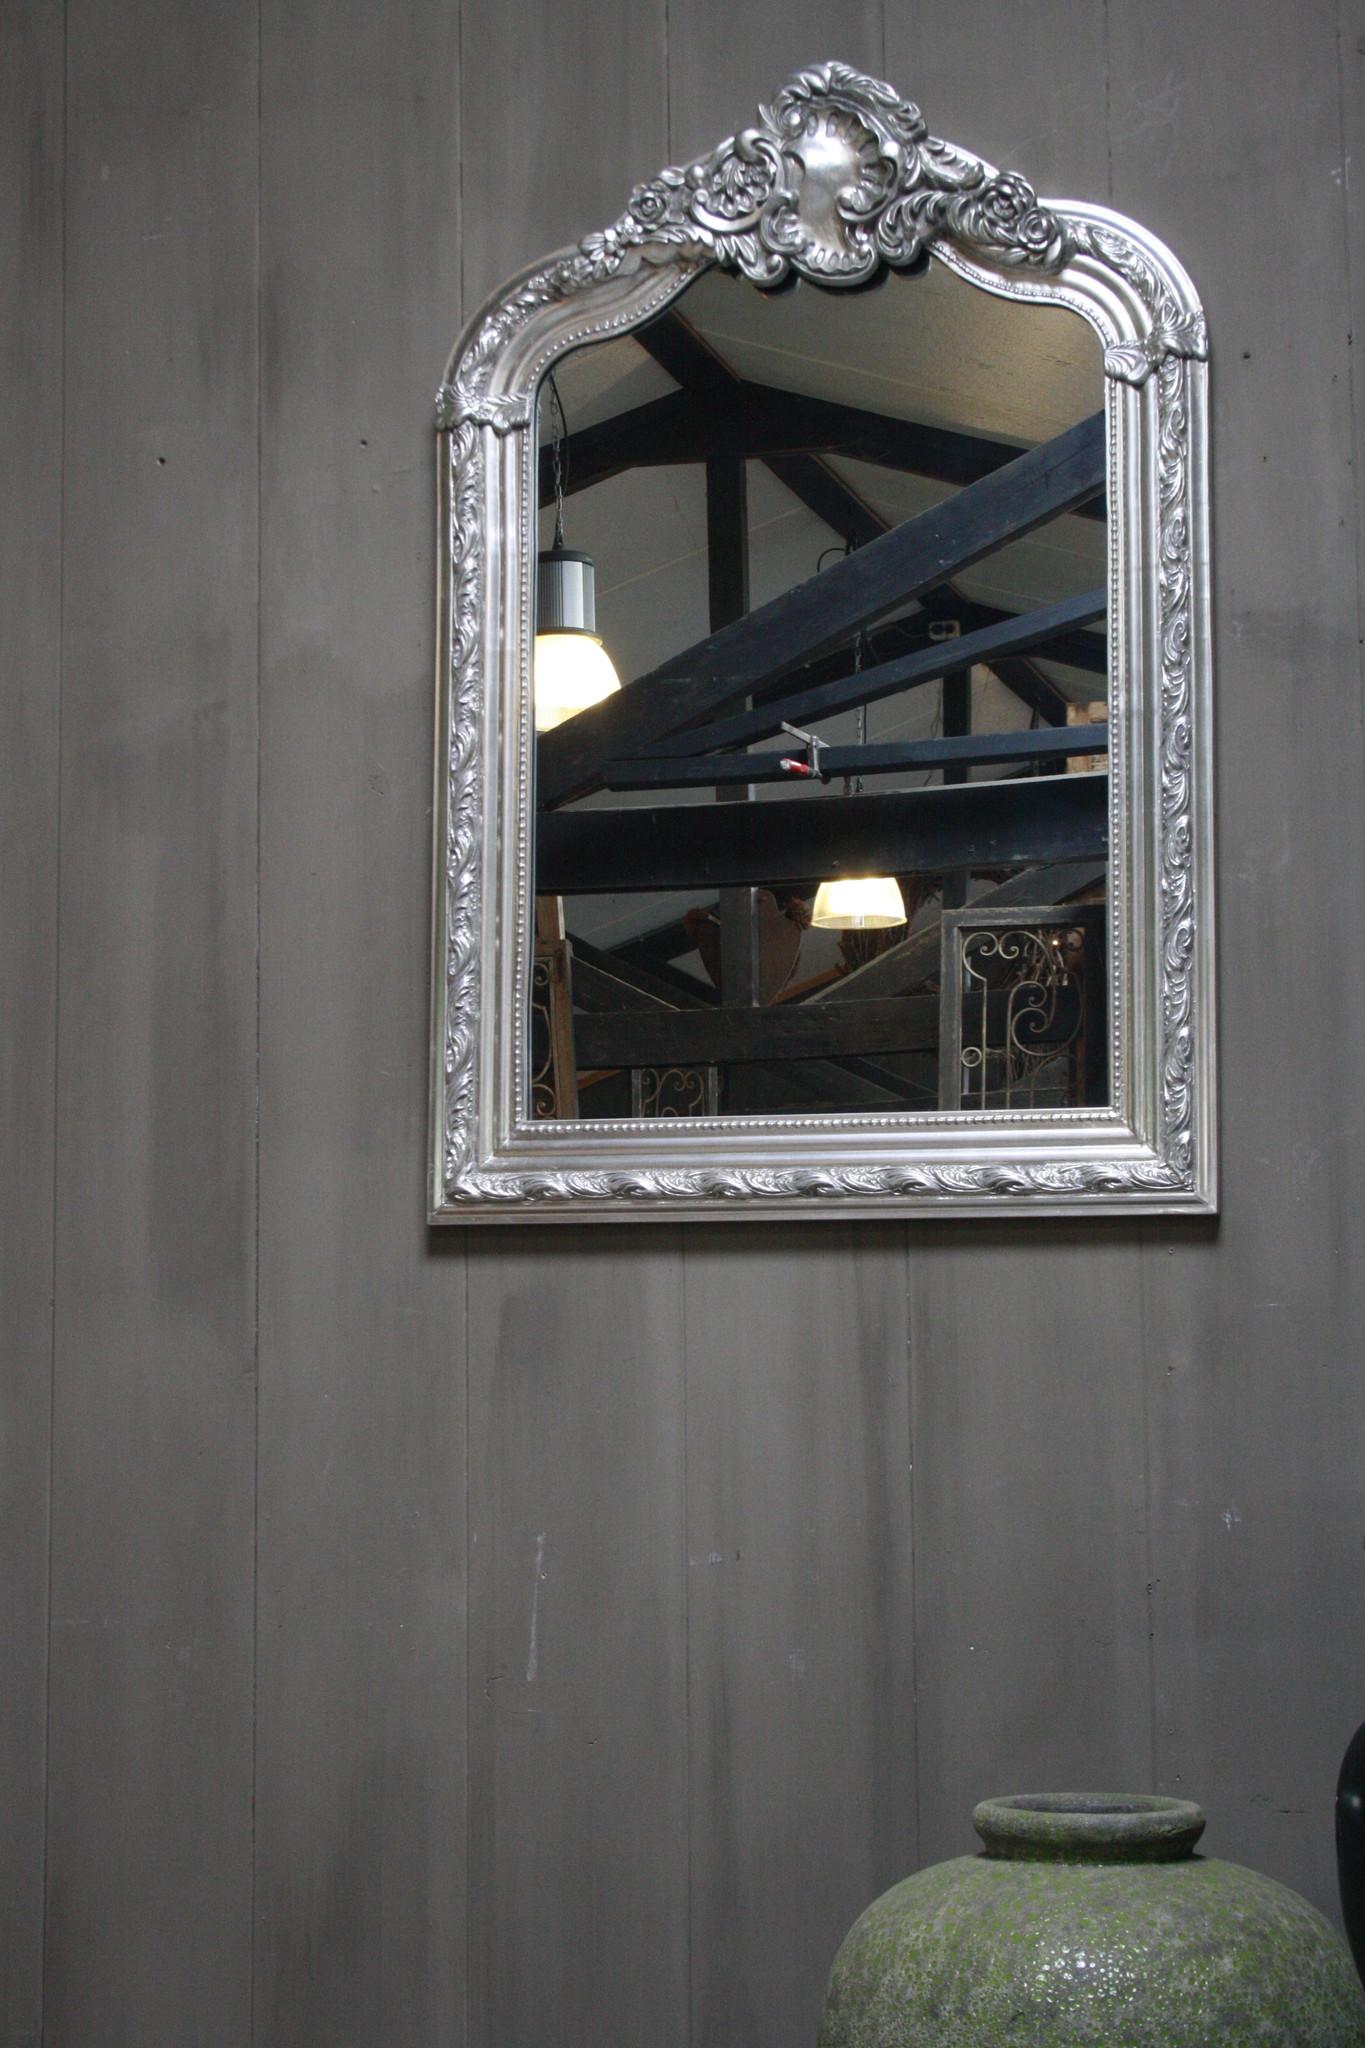 Kuifspiegel Barok Roma Zilver 117 x 80 cm-4